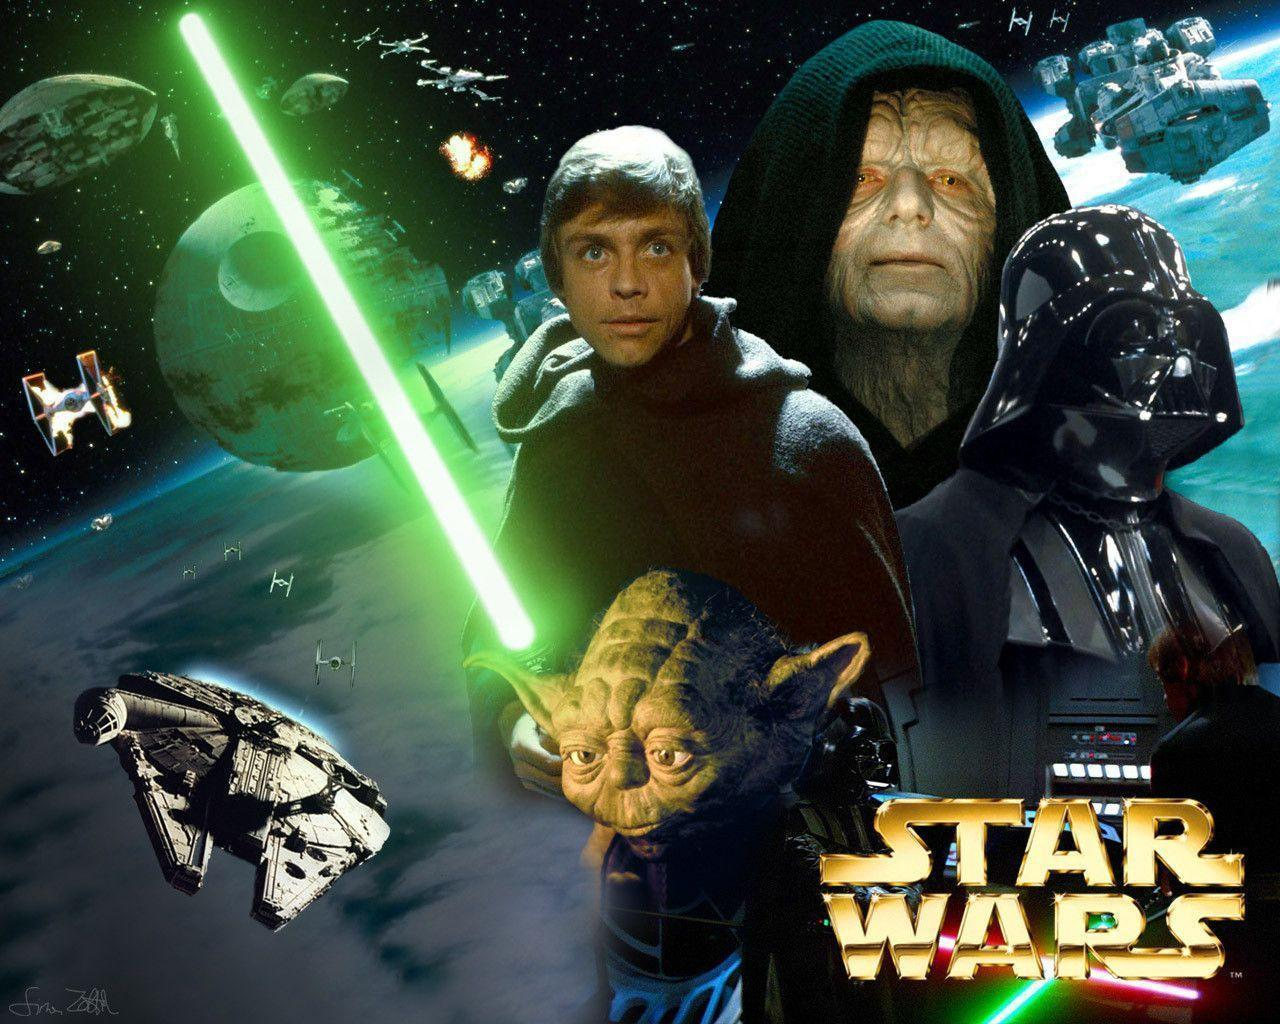 Star Wars Character Wallpapers - Wallpaper Cave